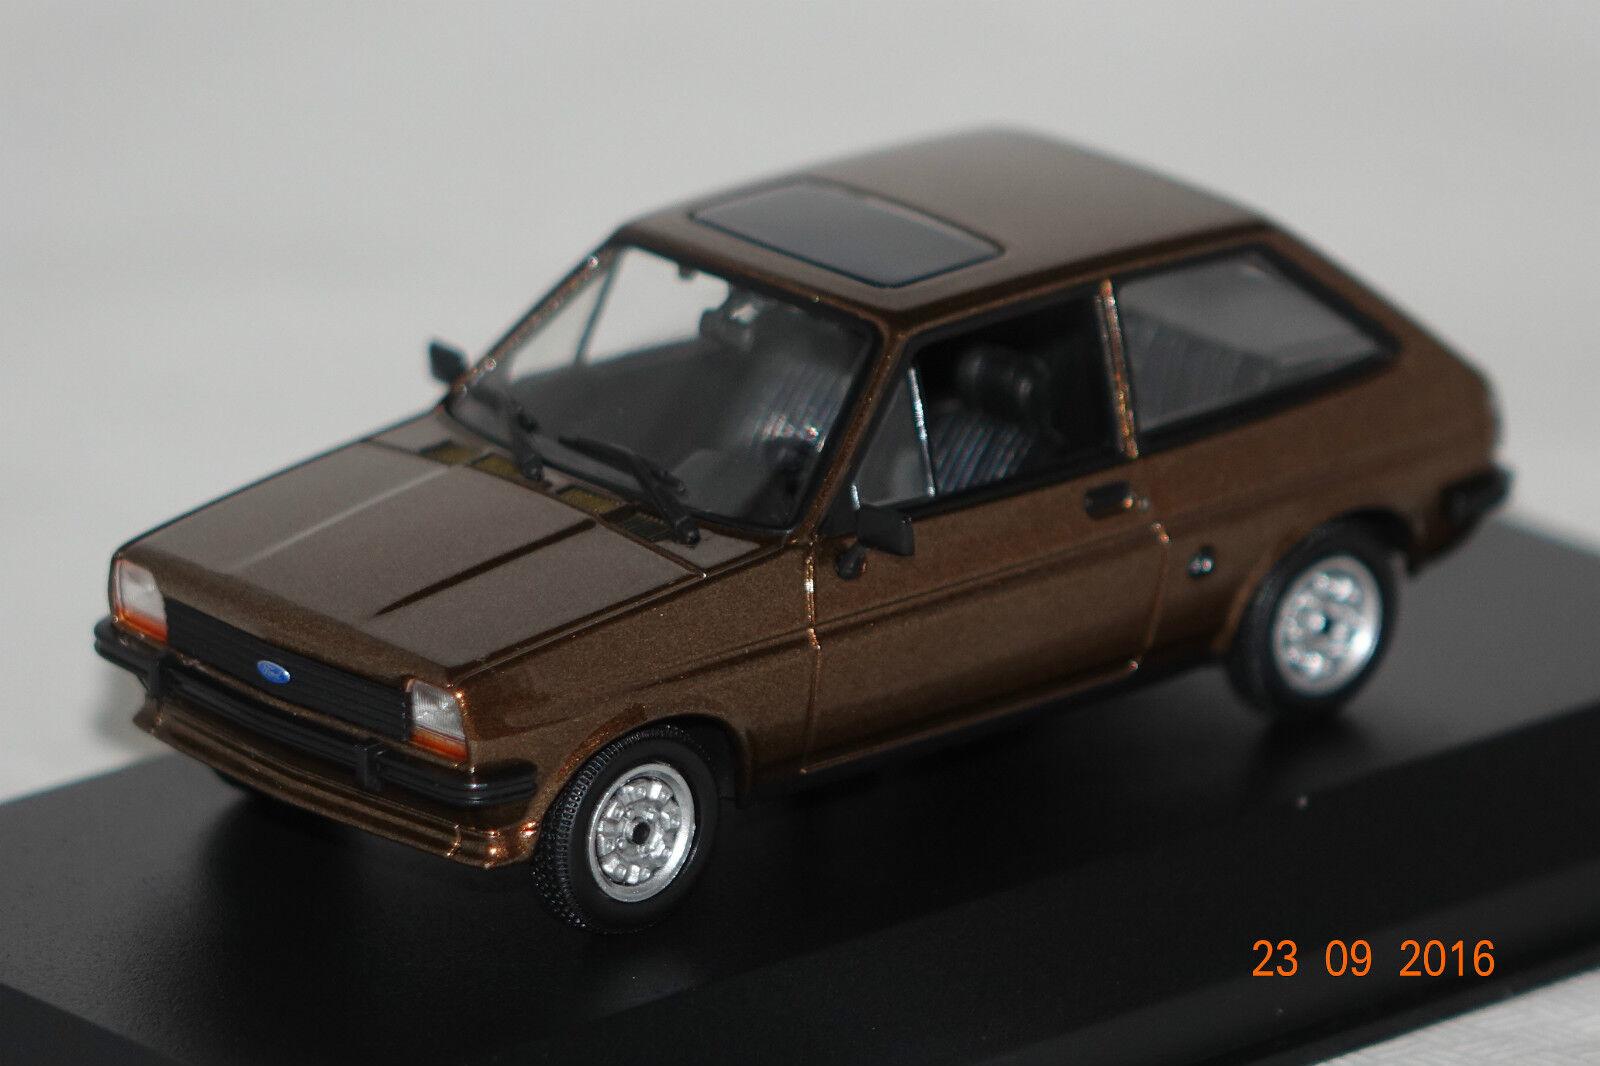 Ford FIESTA 1976 Brun Metallic 1 43 maxichamps Minichamps NOUVEAU & OVP 940085101